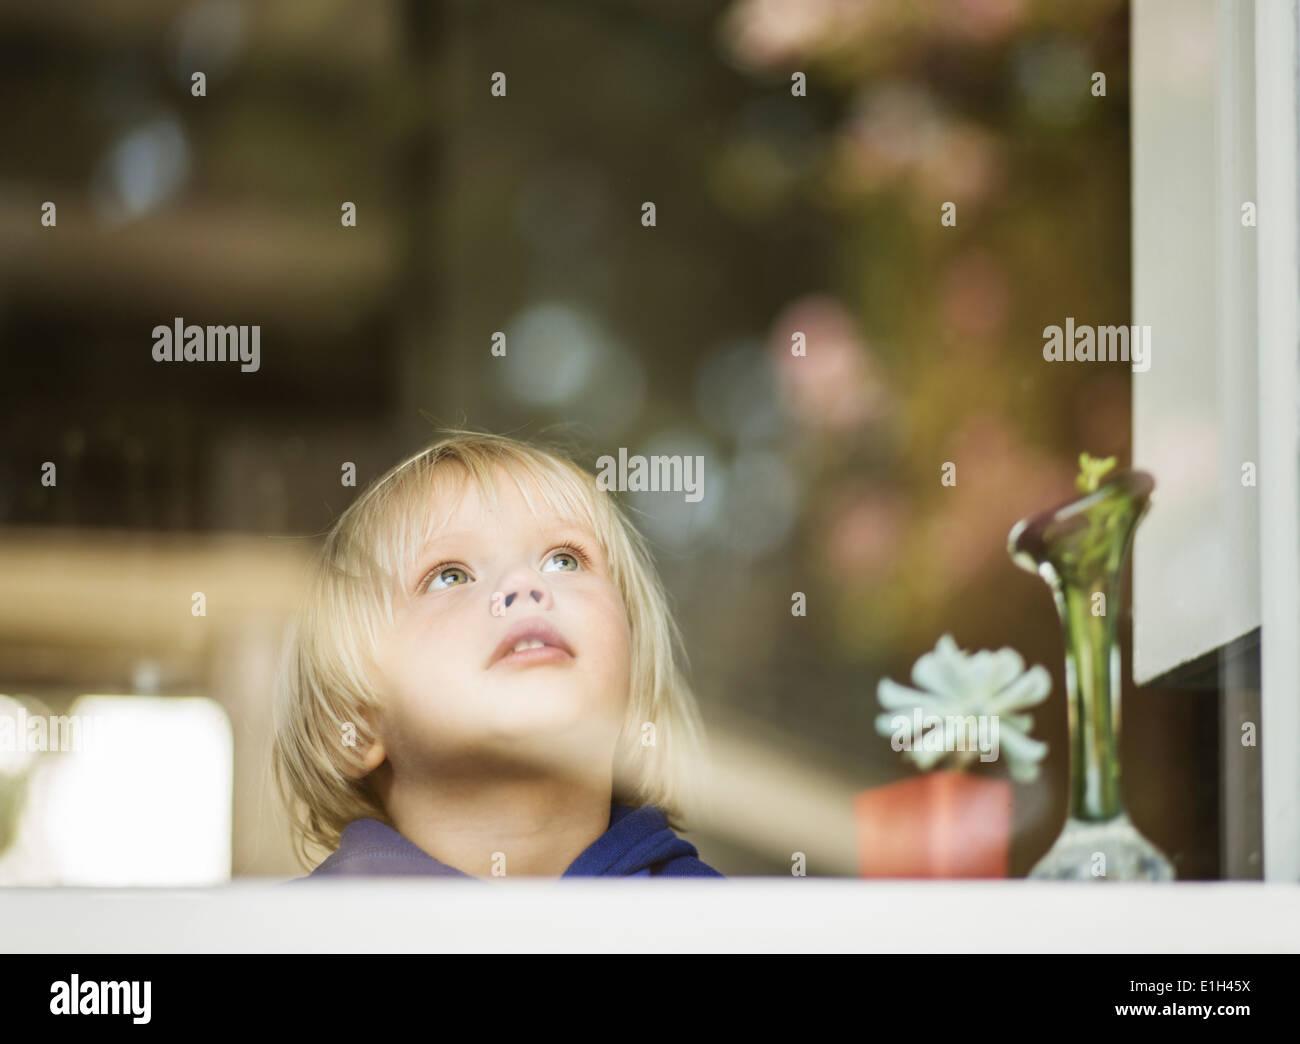 Young boy at house window gazing upward - Stock Image